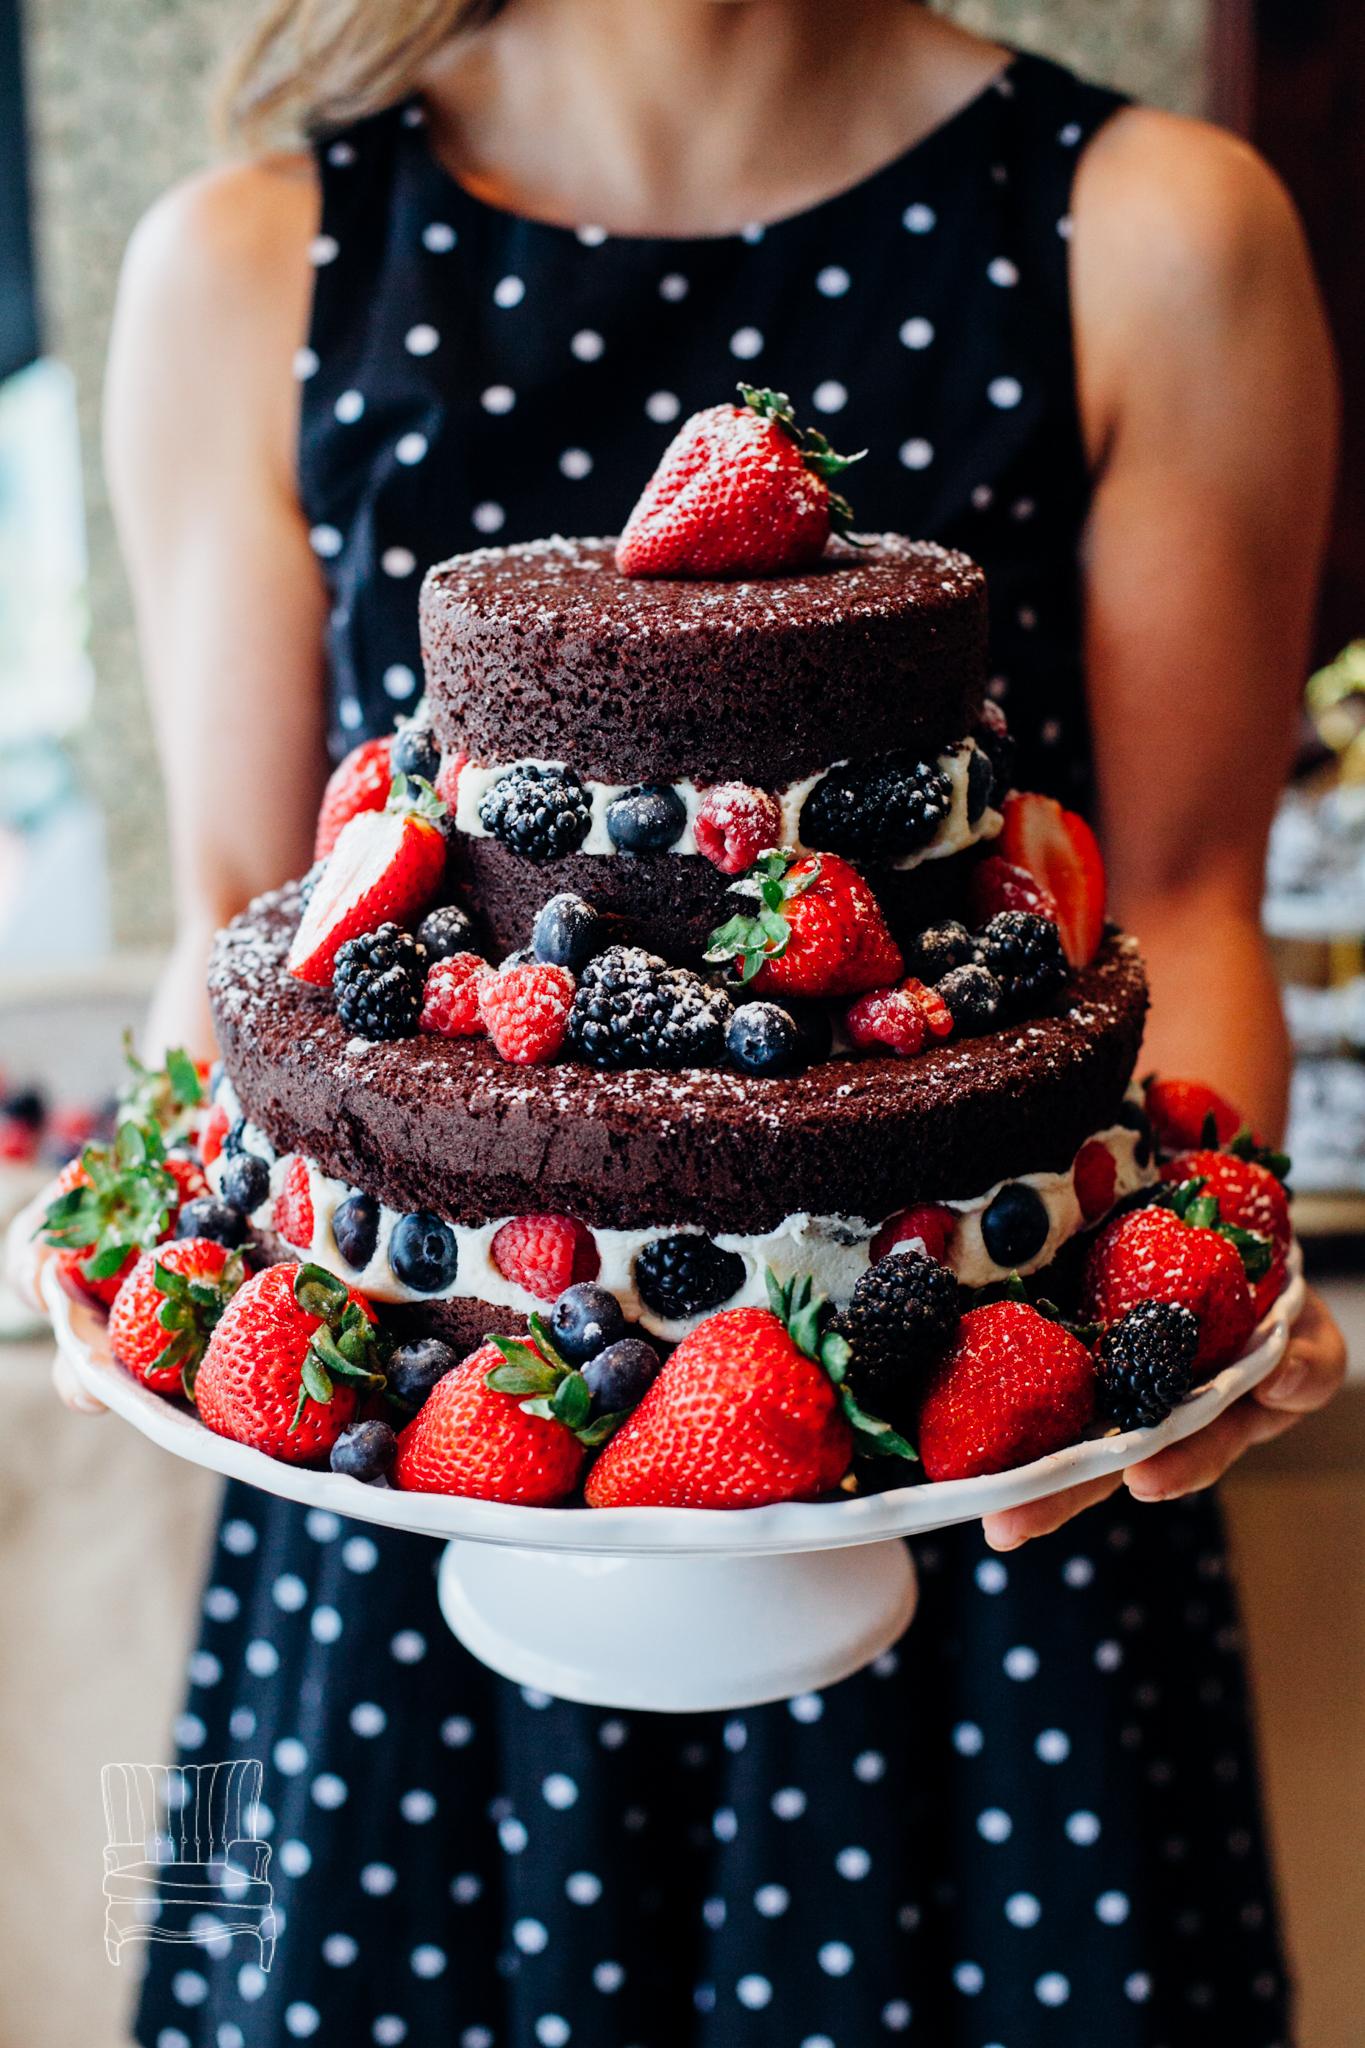 bellingham-seattle-marketing-food-photographer-dessert-slice-of-heaven-5.jpg